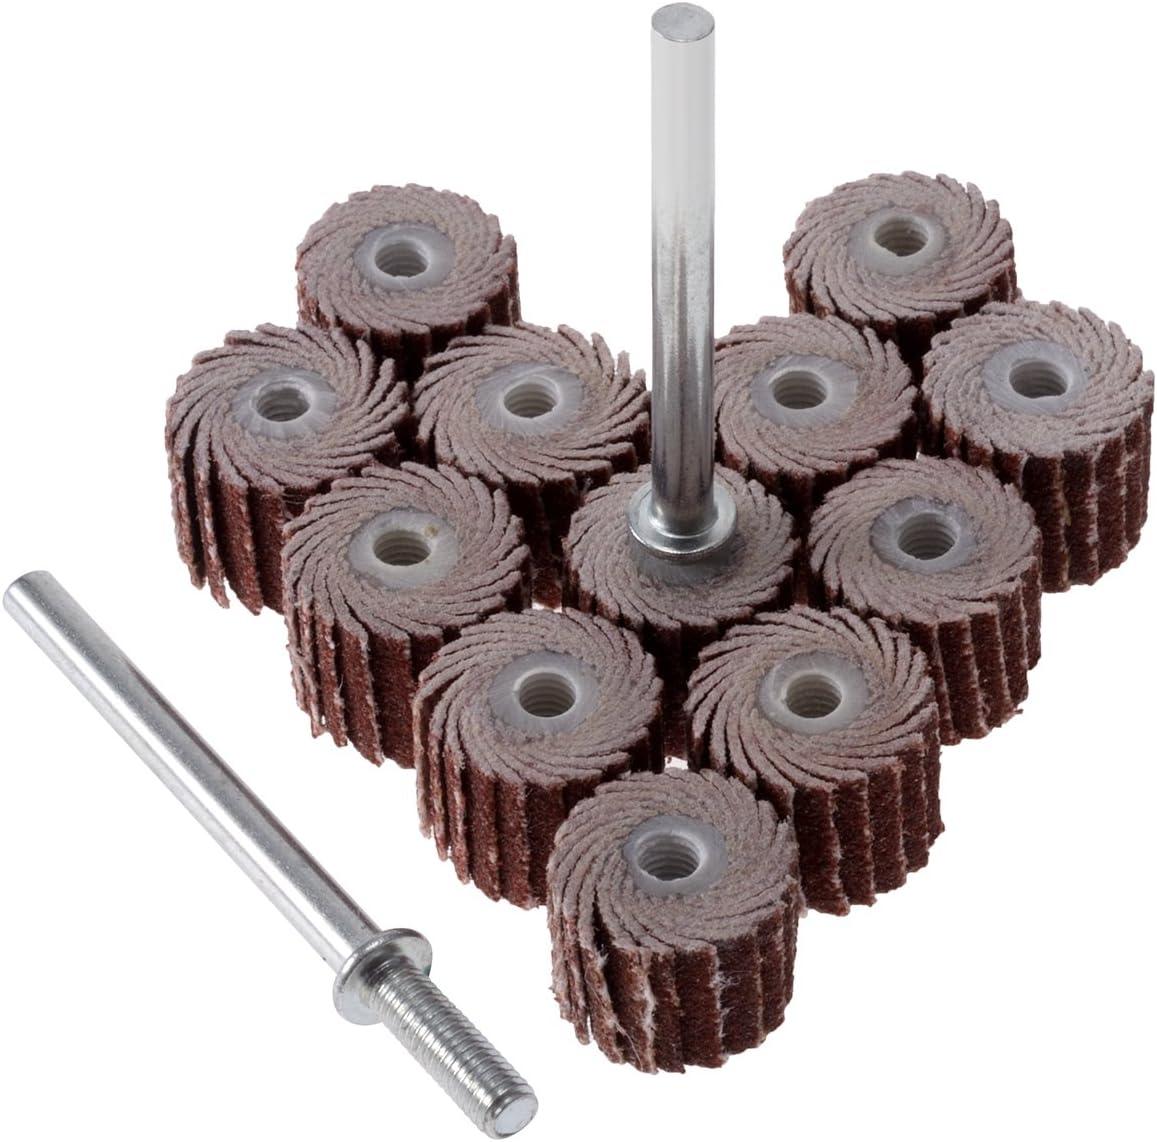 "Flap Wheel 10mm x 10mm 240 Grit Abrasive Grinding Head with 1//8/"" Arbor 10 Pcs"